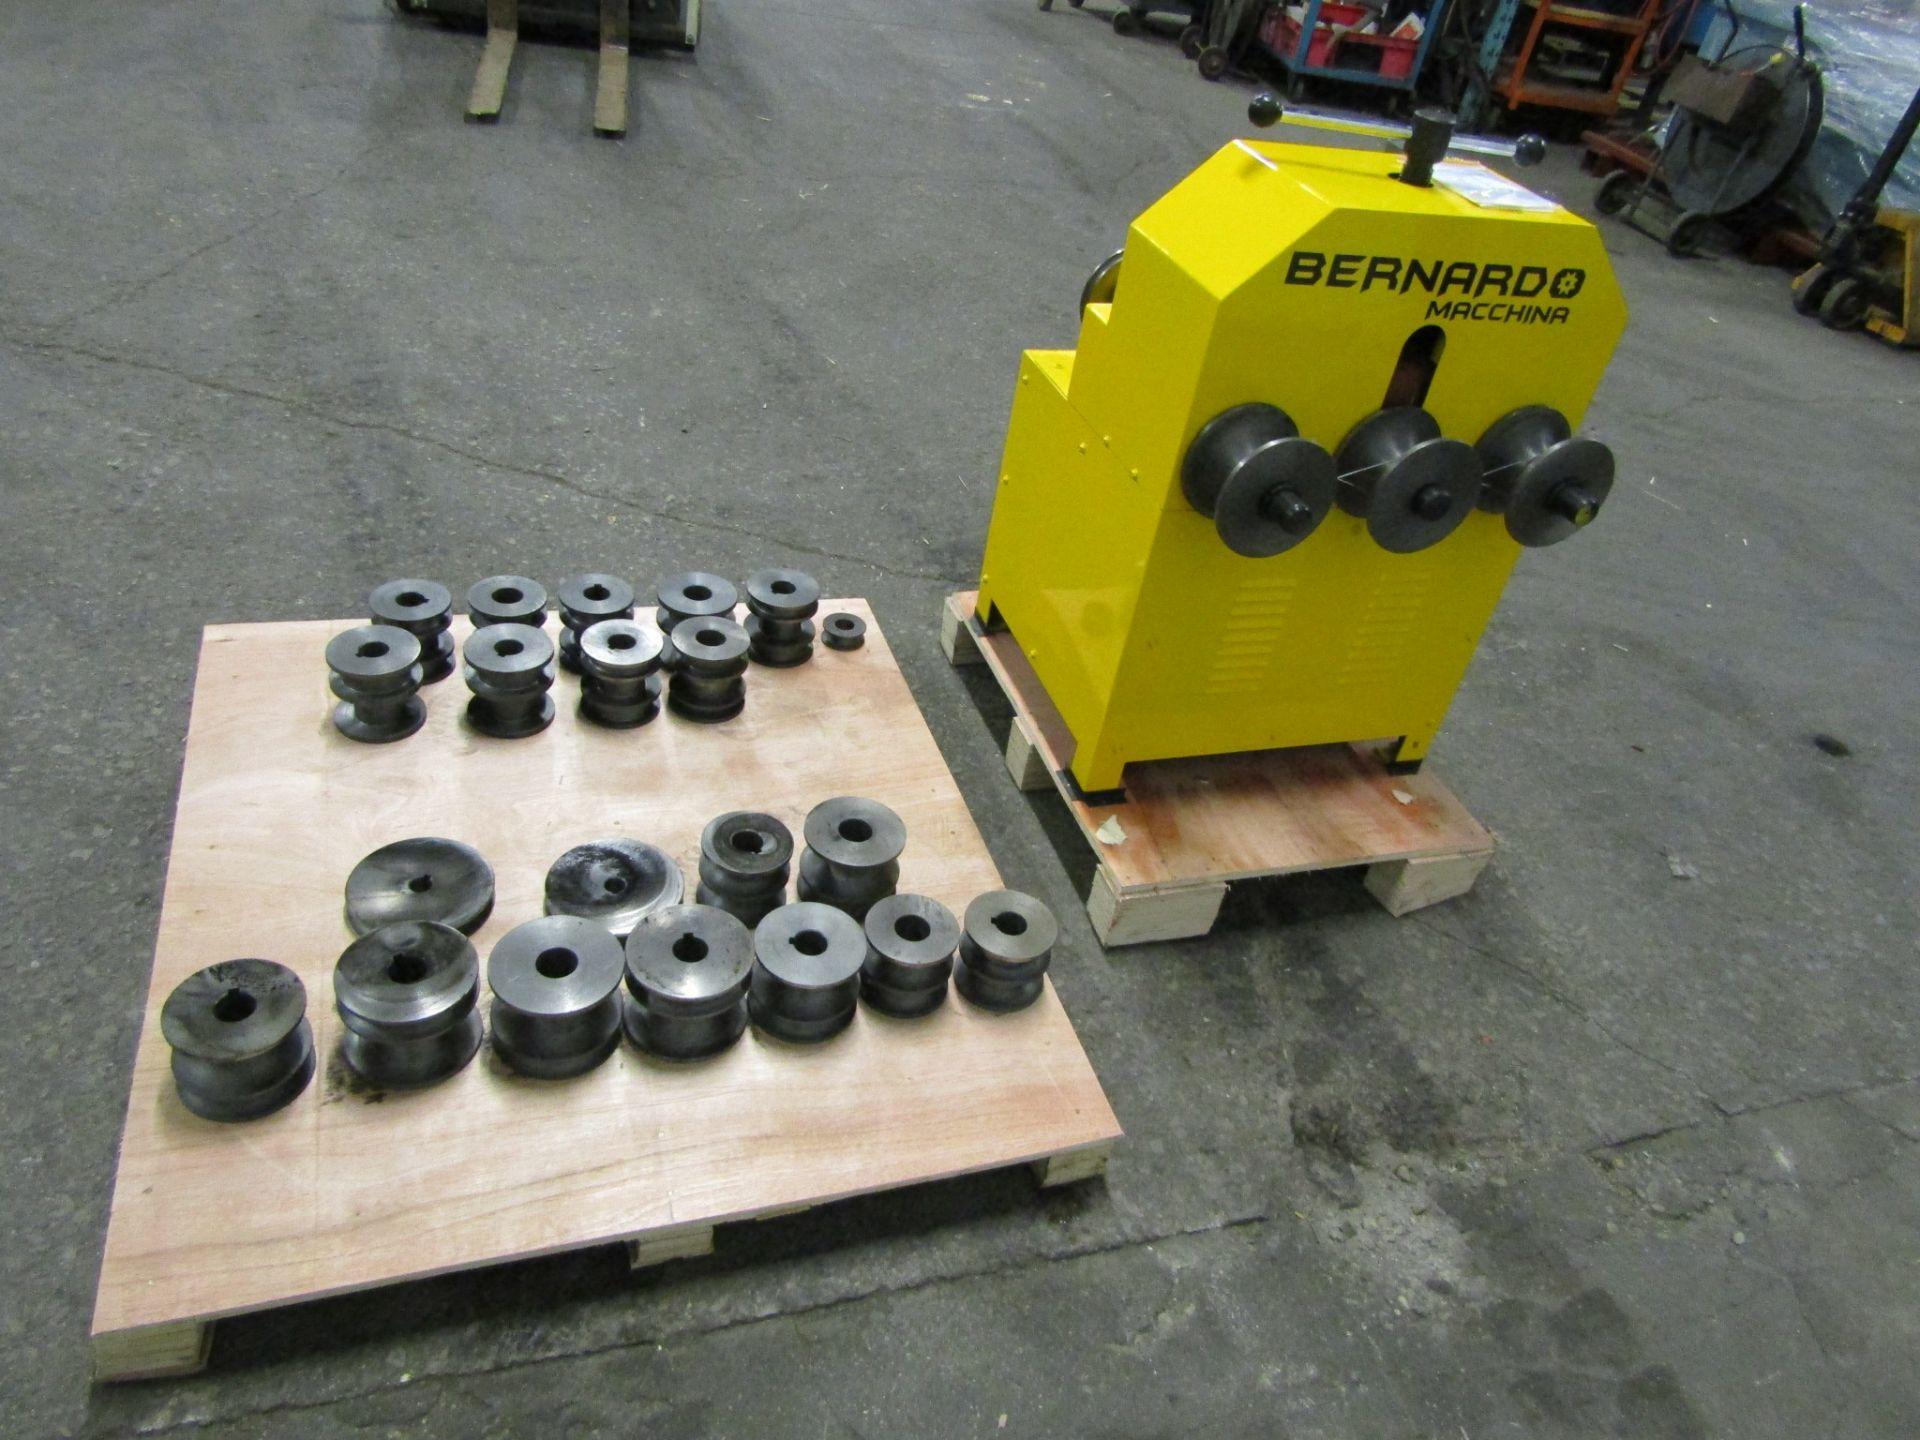 "Lot 238 - Bernardo Pyramid Angle Rolls Conduit Bender - Tube Bender with 22 dies 0.5-3"" capacity MINT / UNUSED"